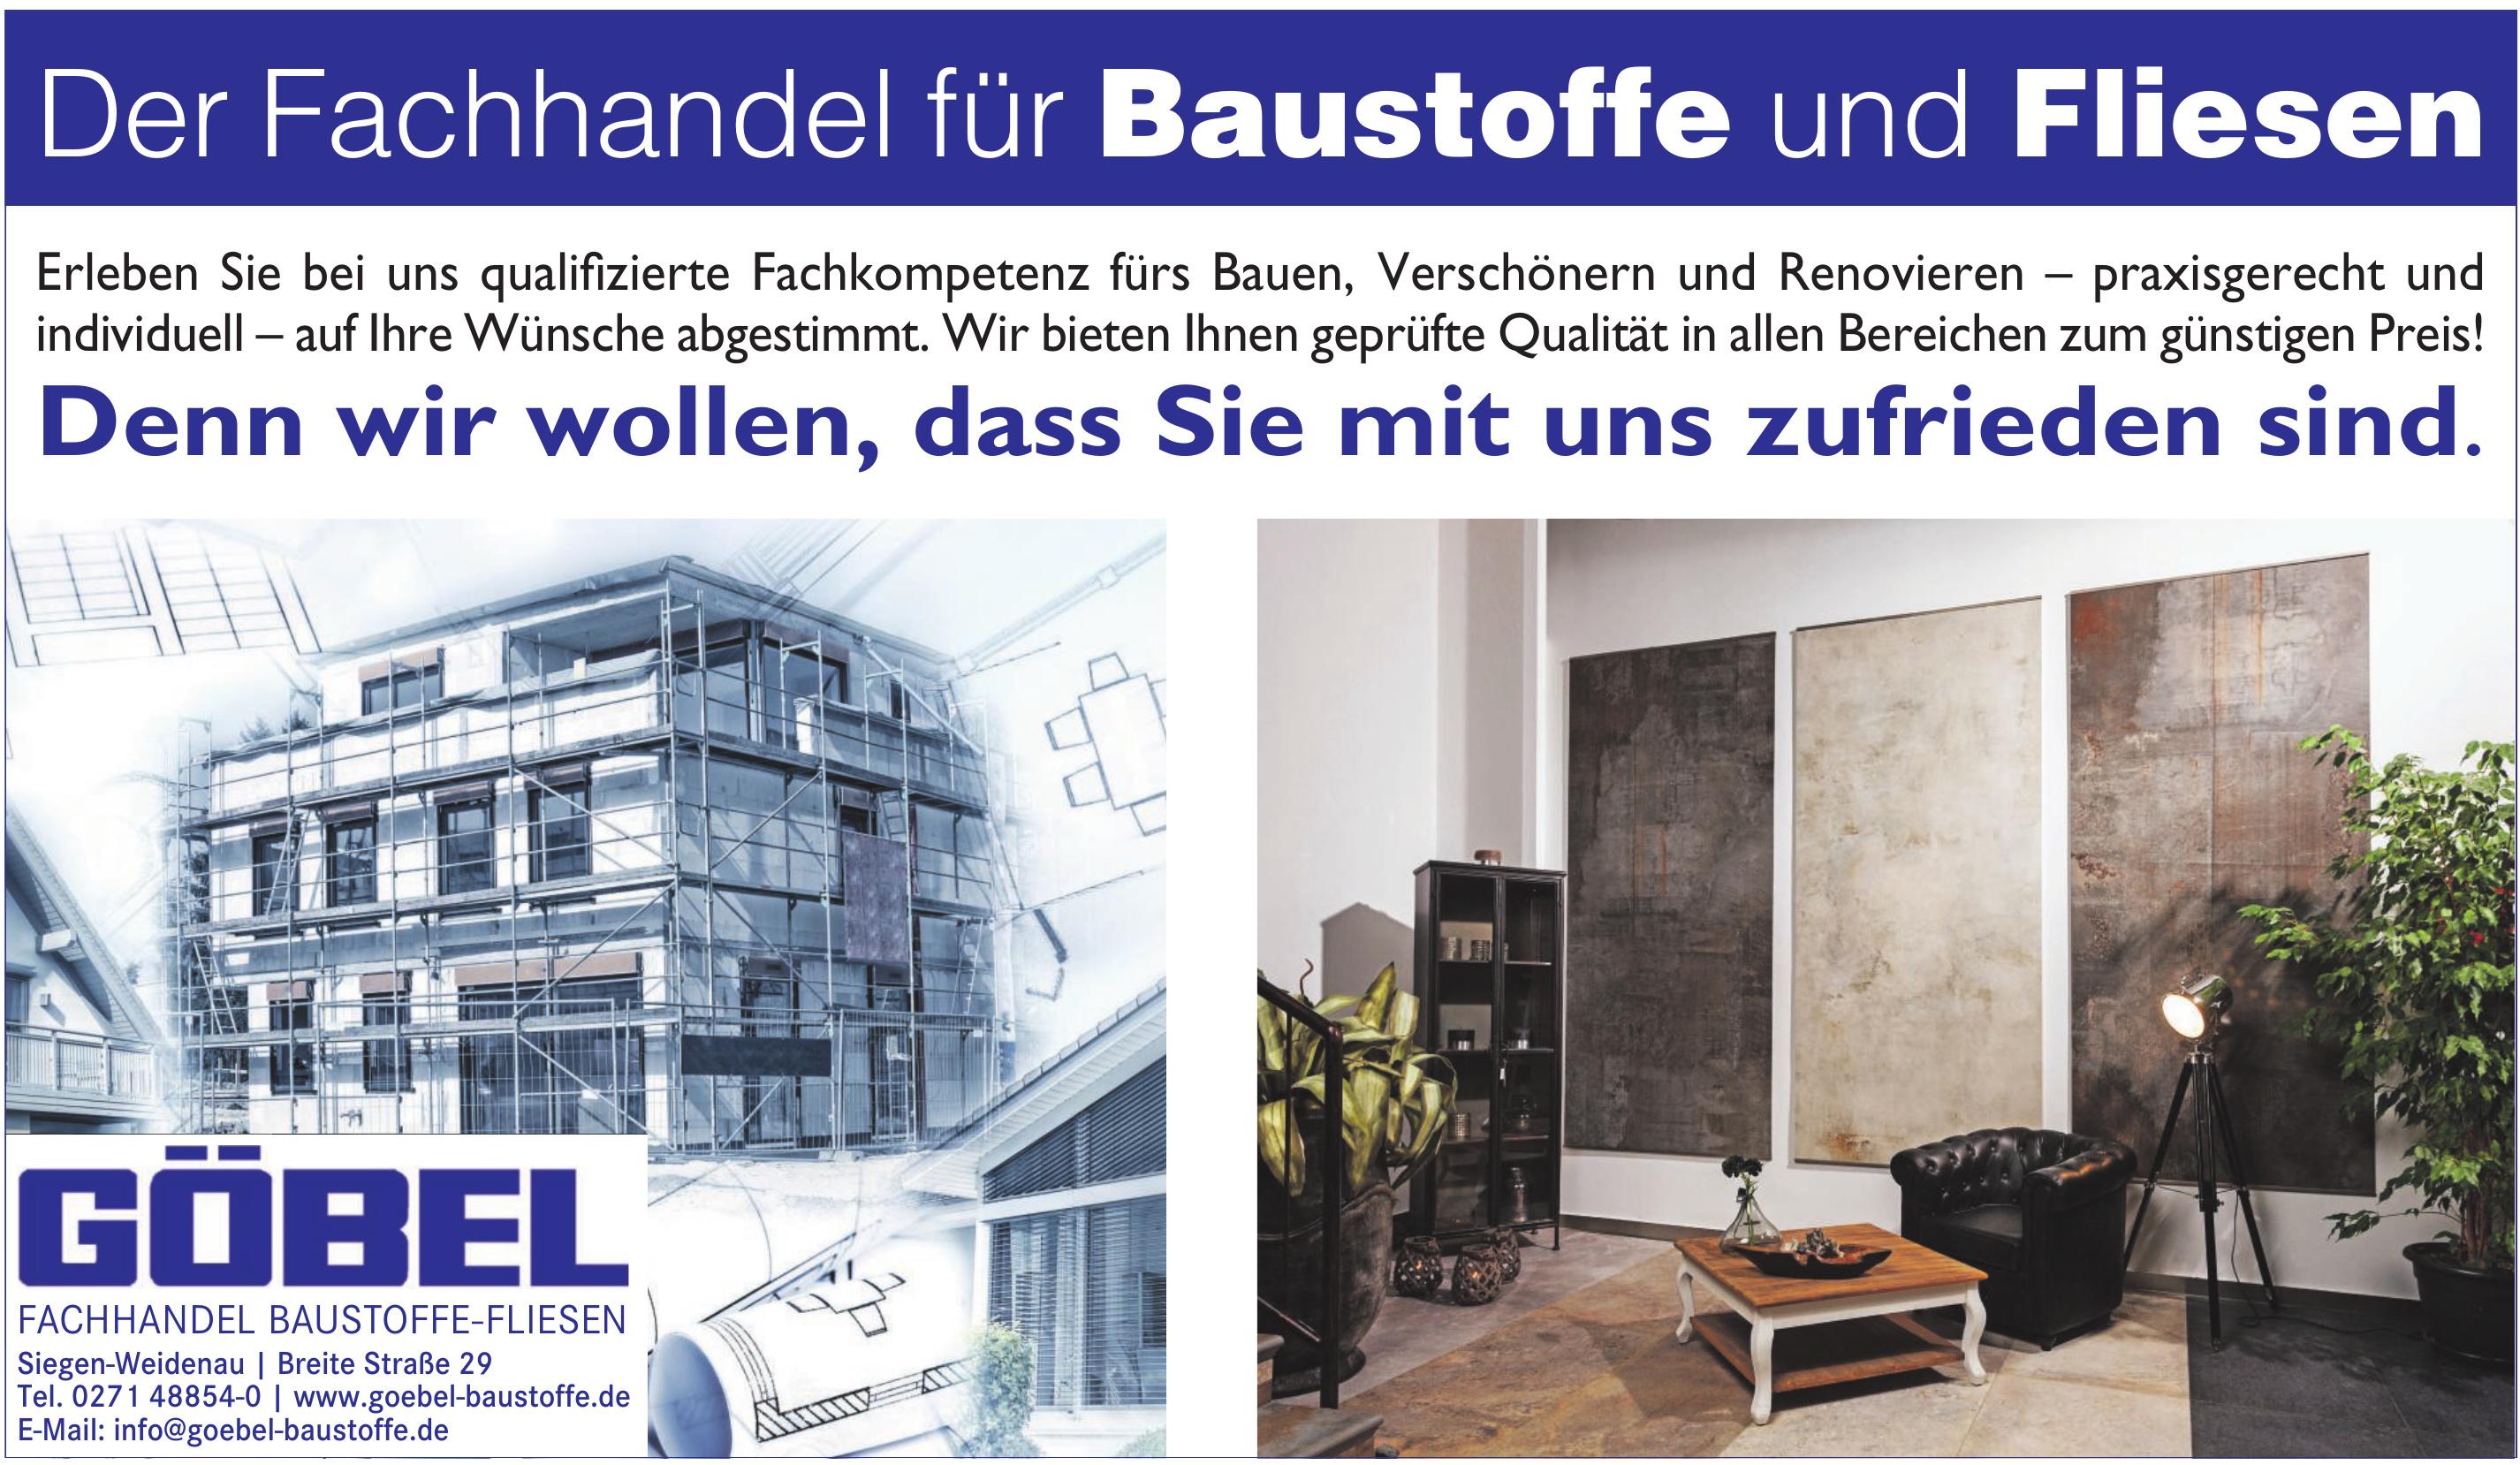 R. Göbel Baufachhandel GmbH